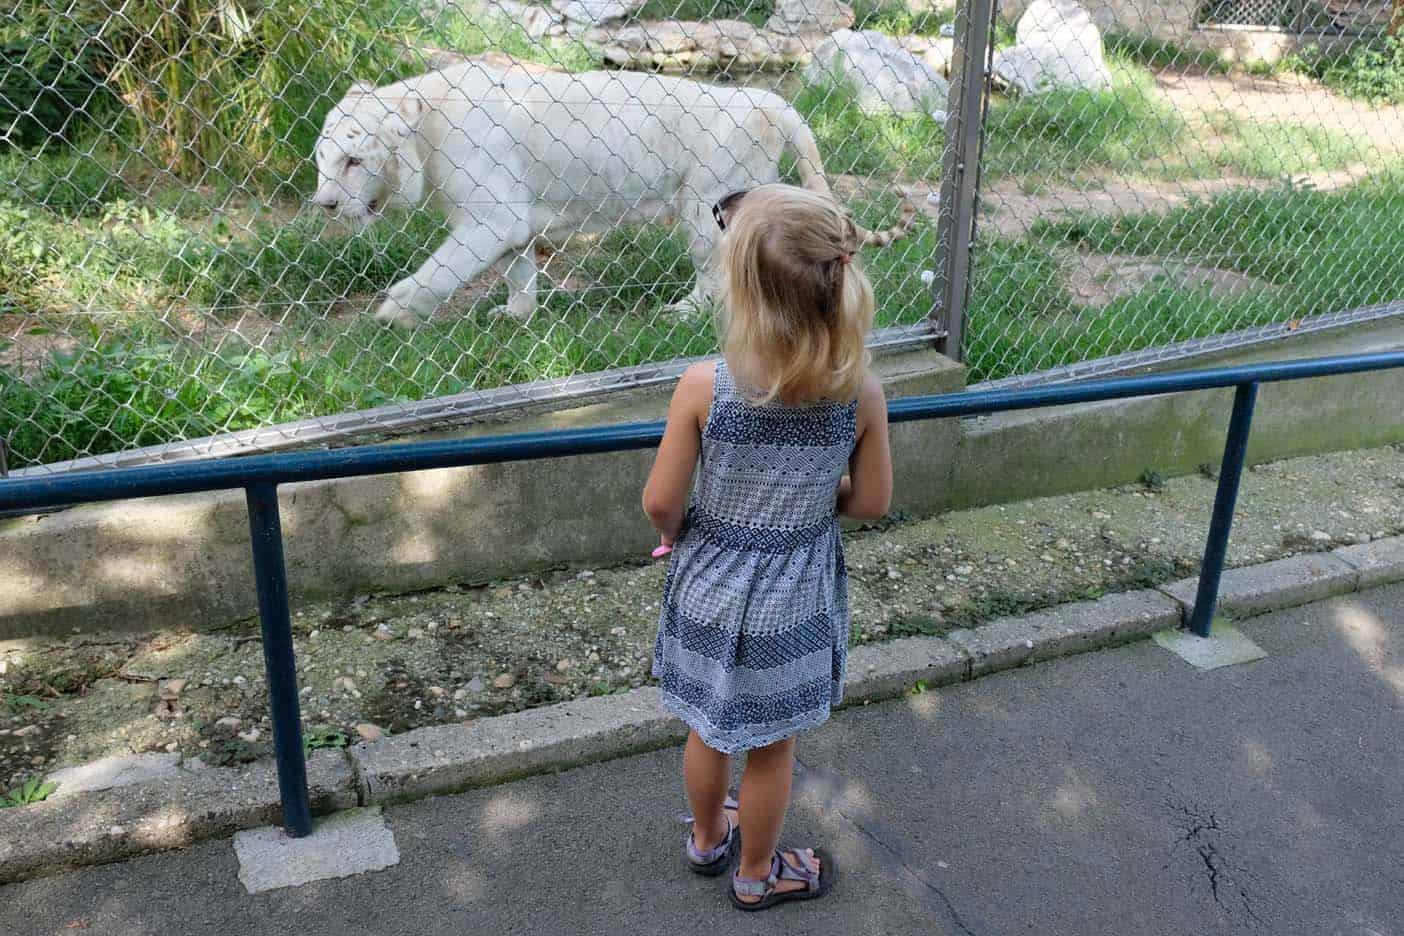 Belgrado dierentuin